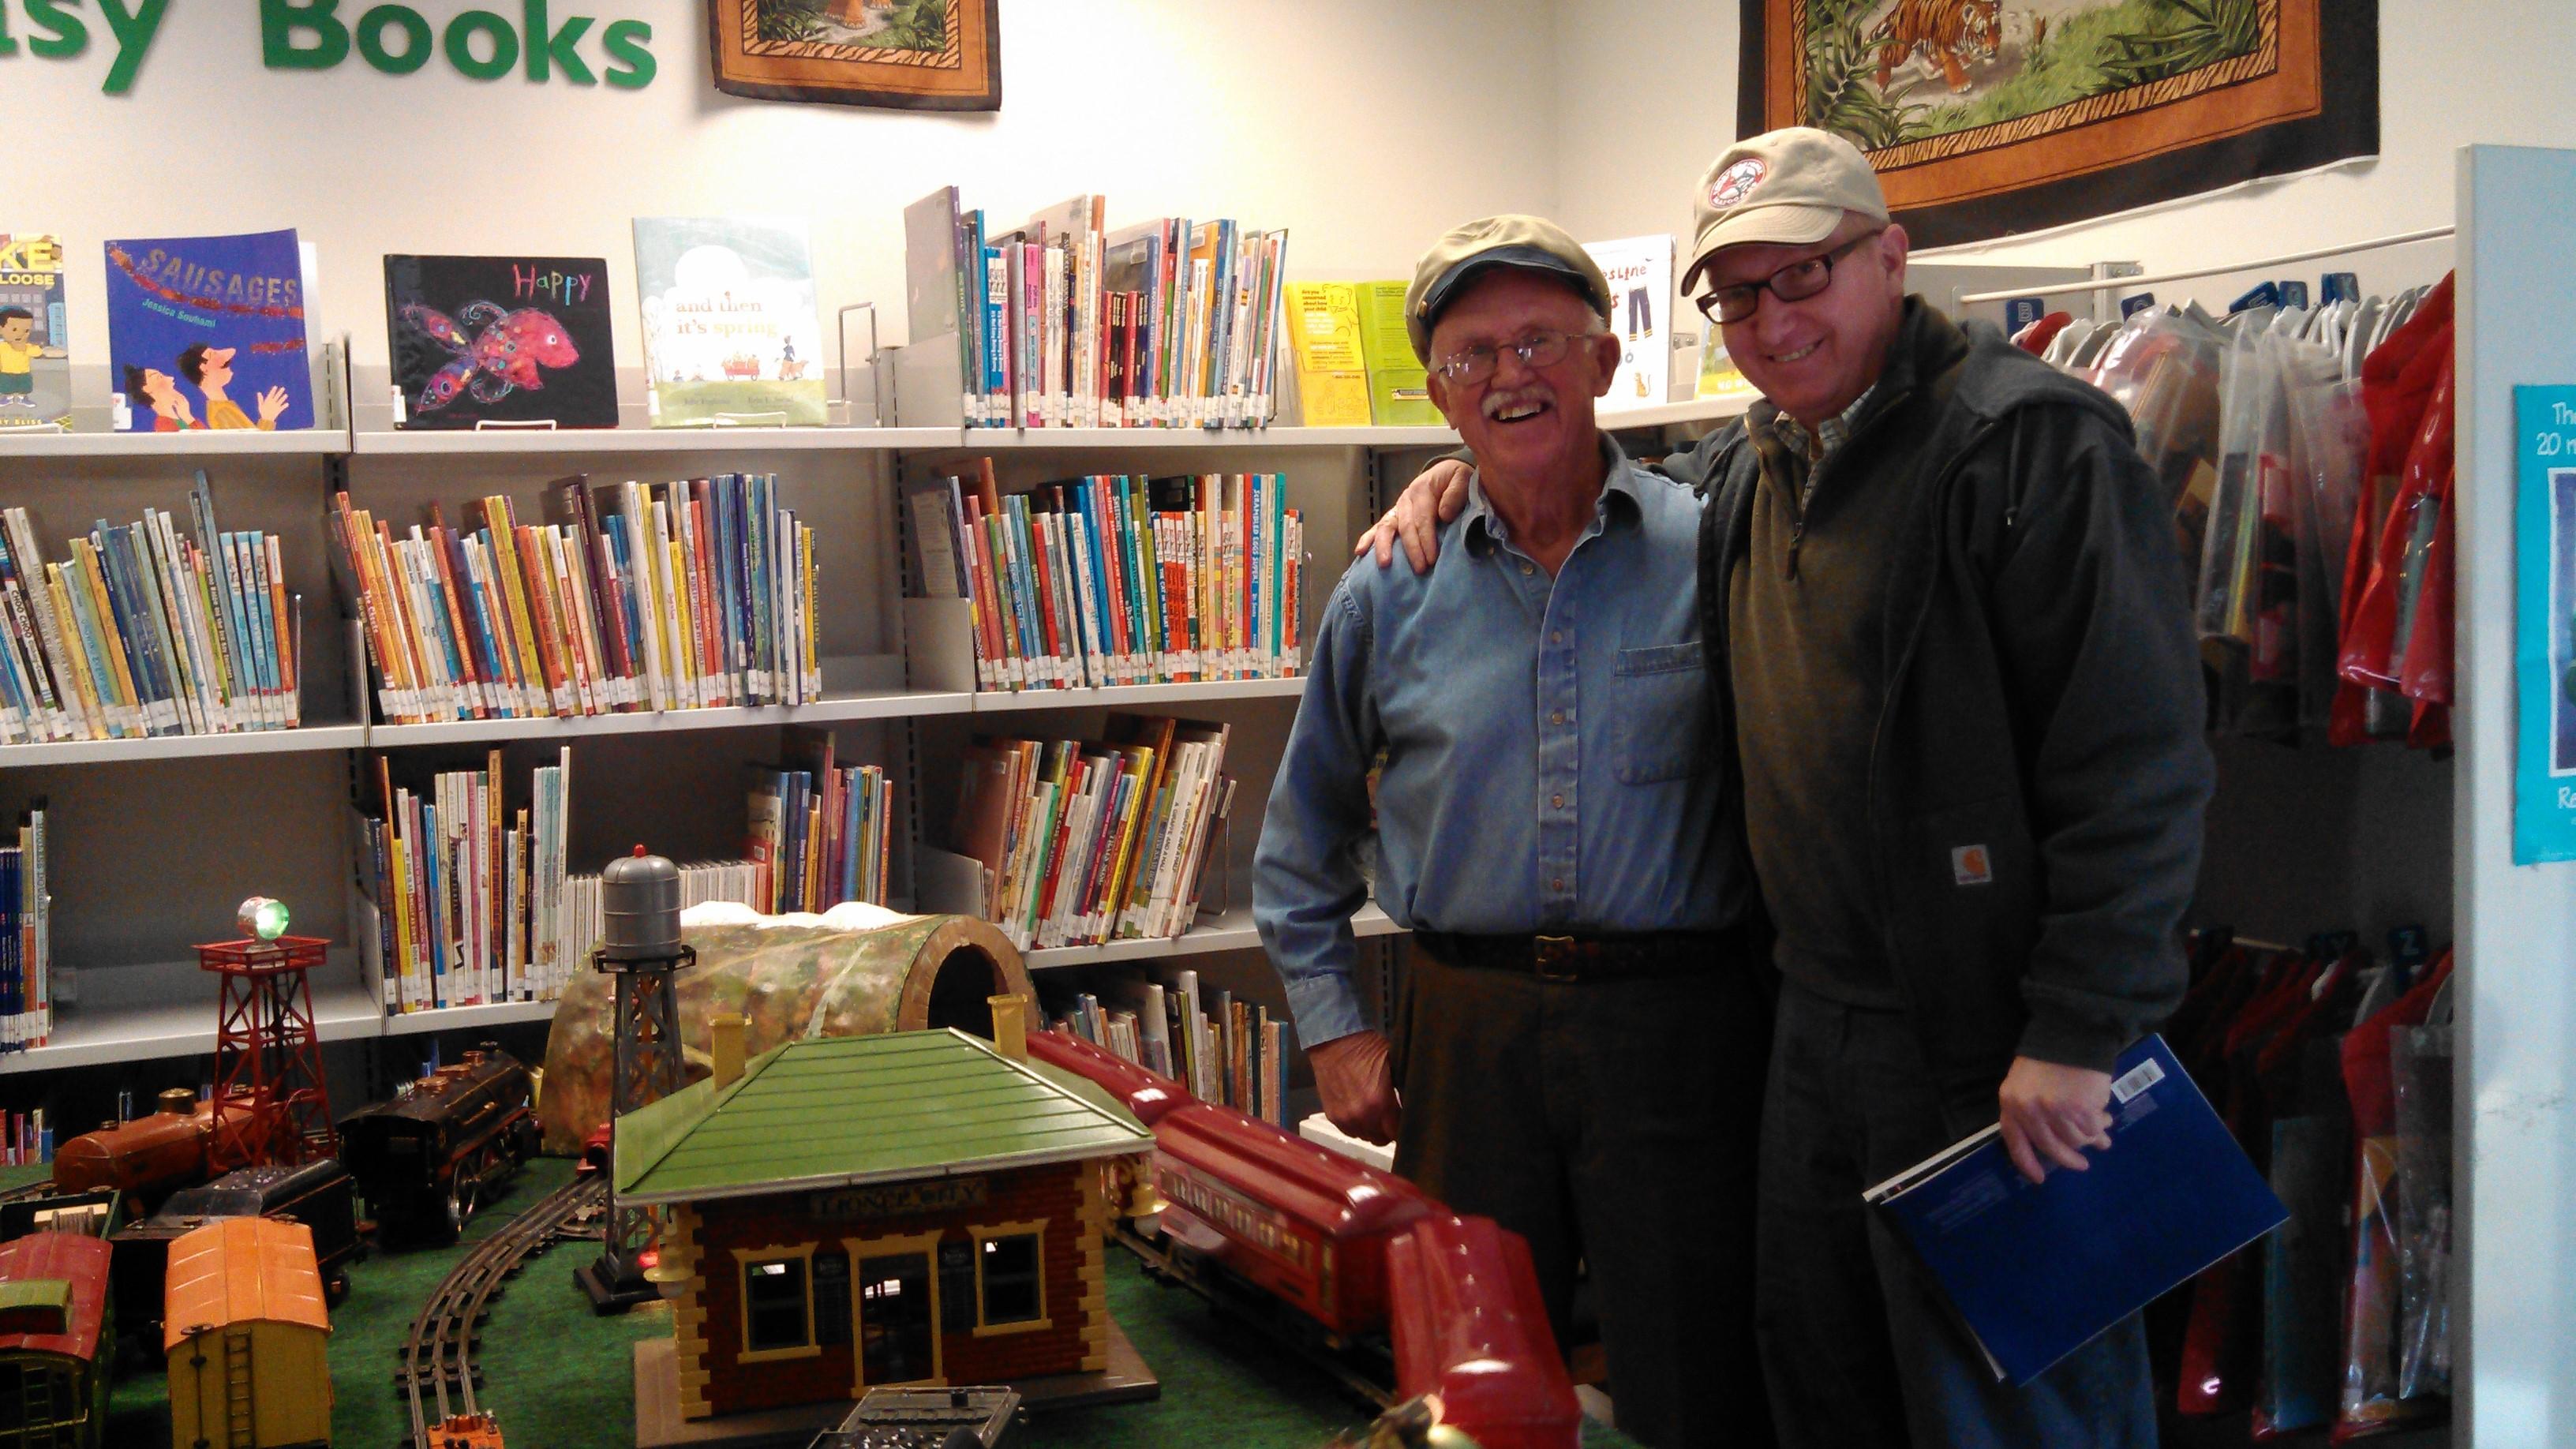 4th Annual Toy Train & Model Railroad Exhibit